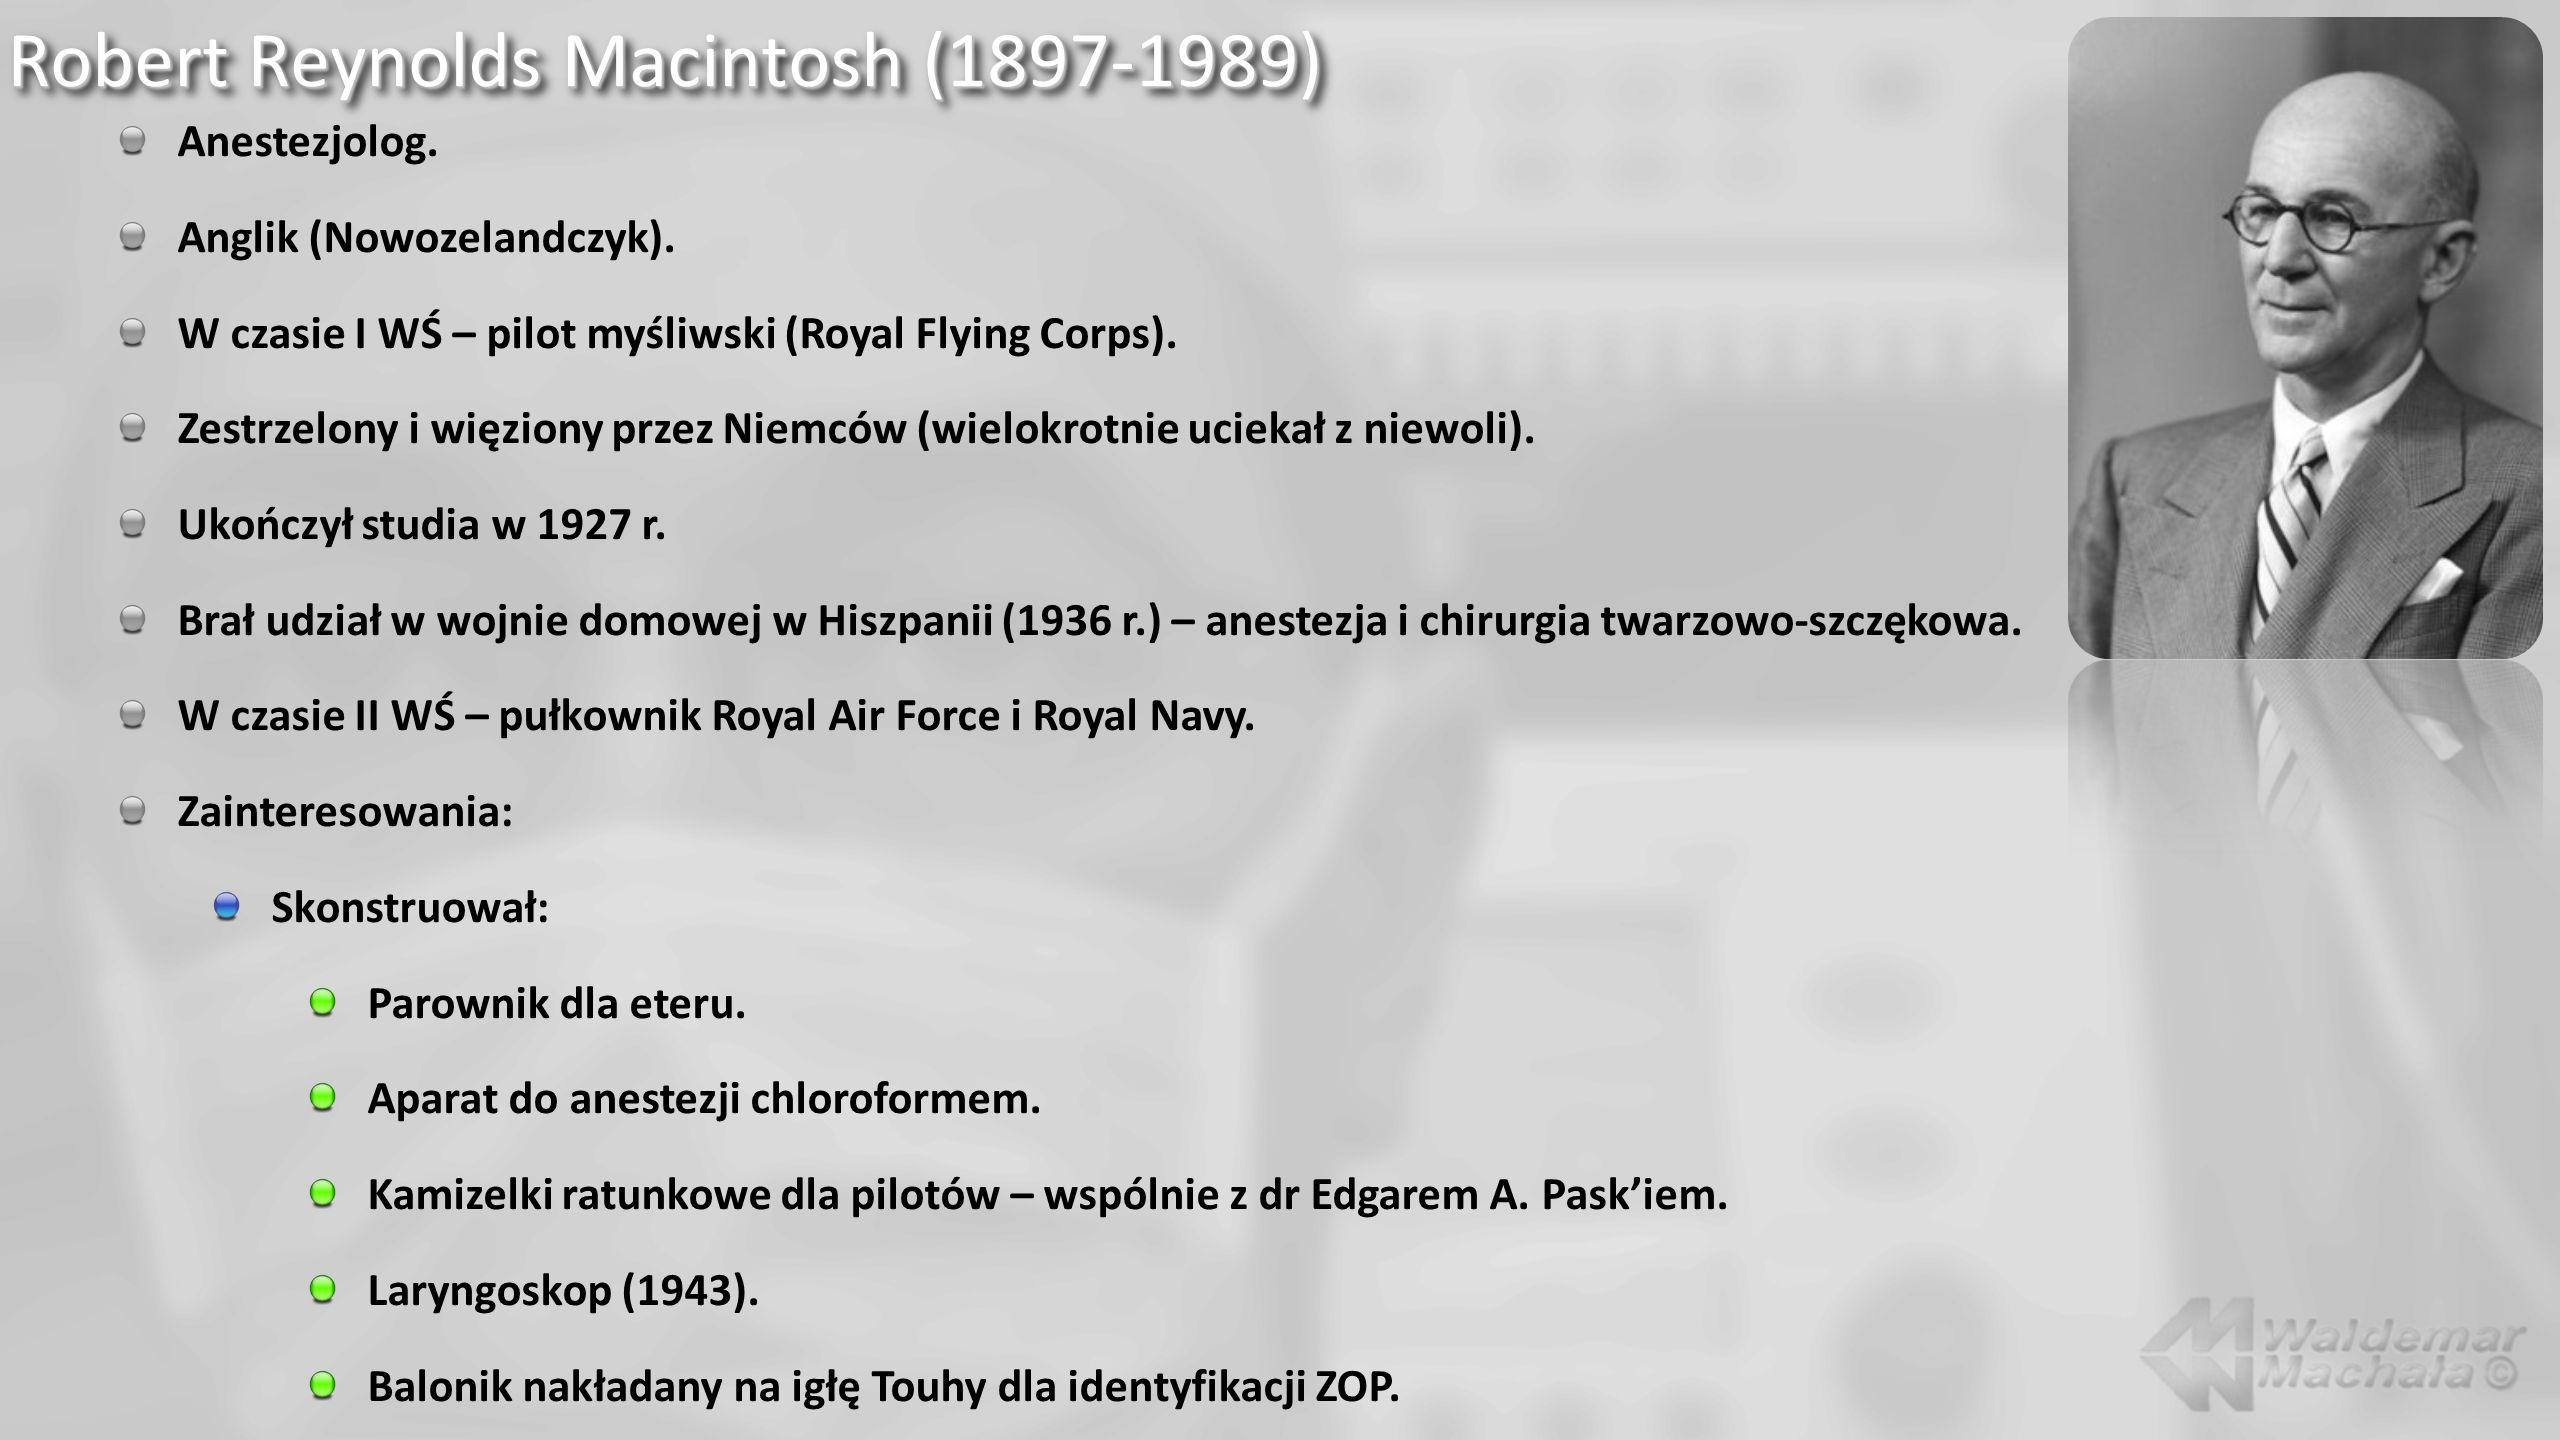 Robert Reynolds Macintosh (1897-1989)